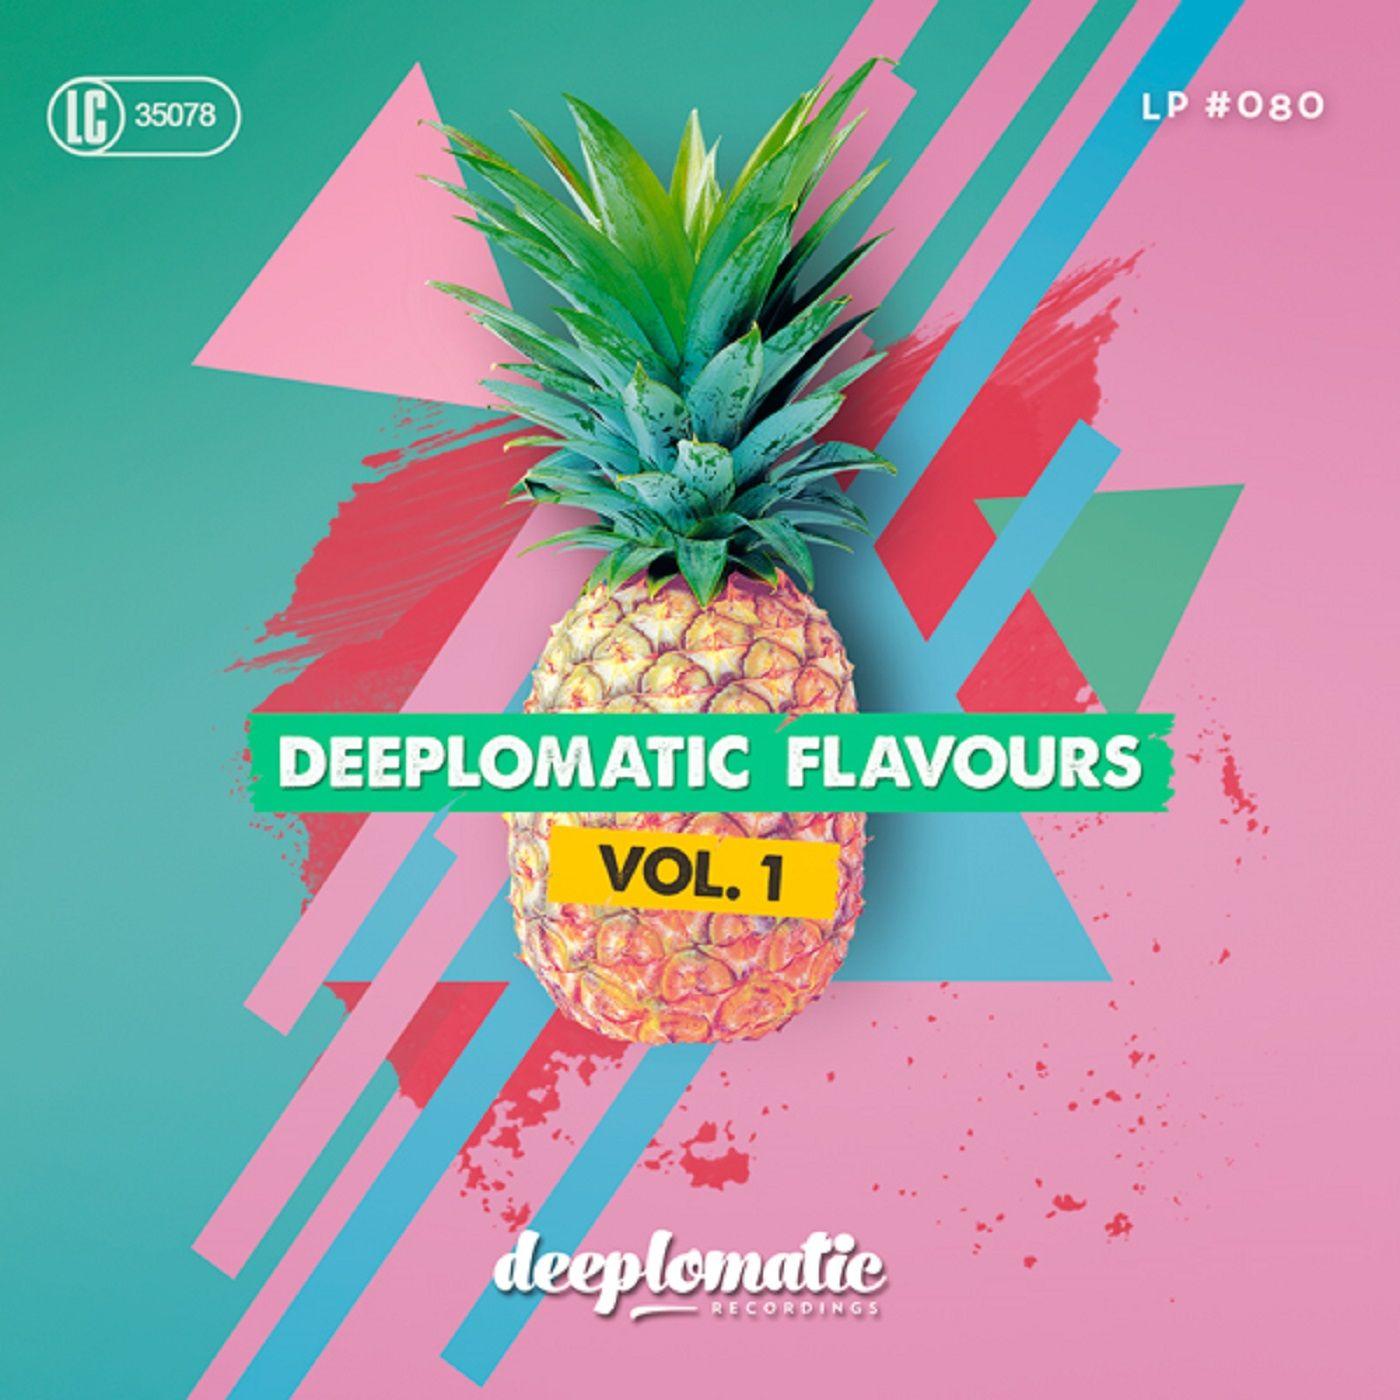 deeplomatic_flavours_vol._1.jpg